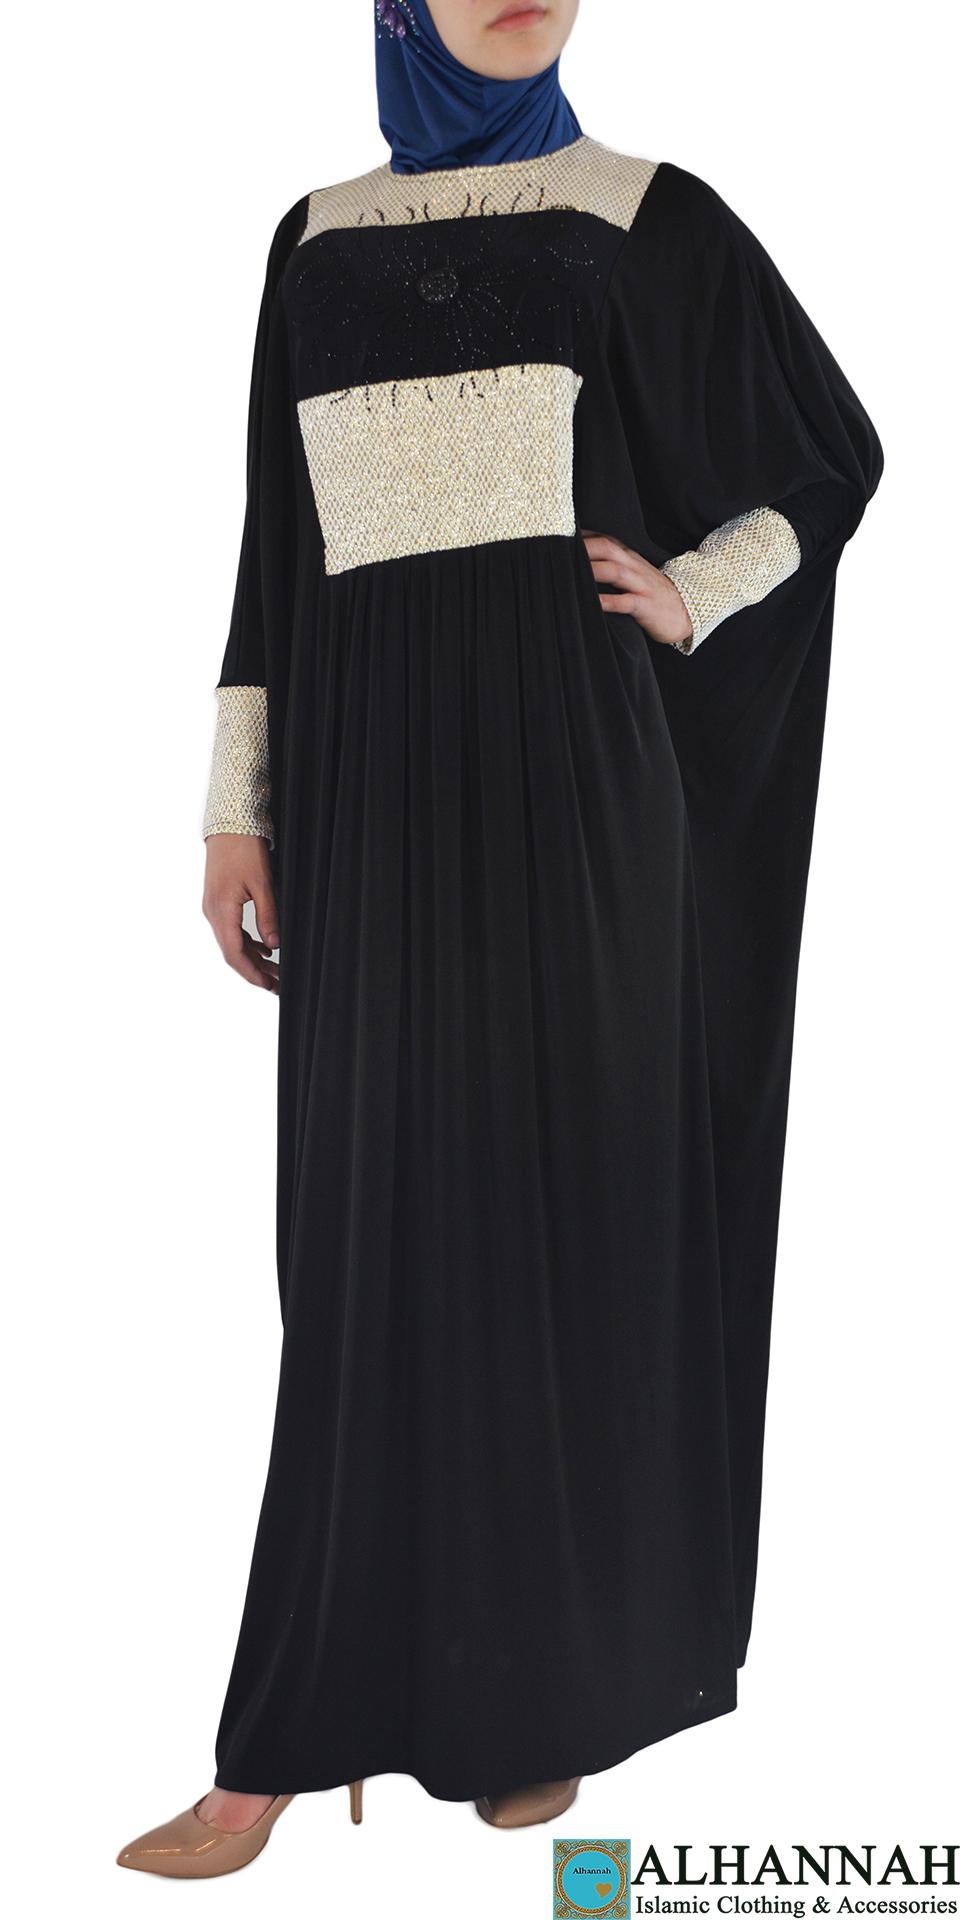 Nazli - Honeycomb Draping Abaya Front